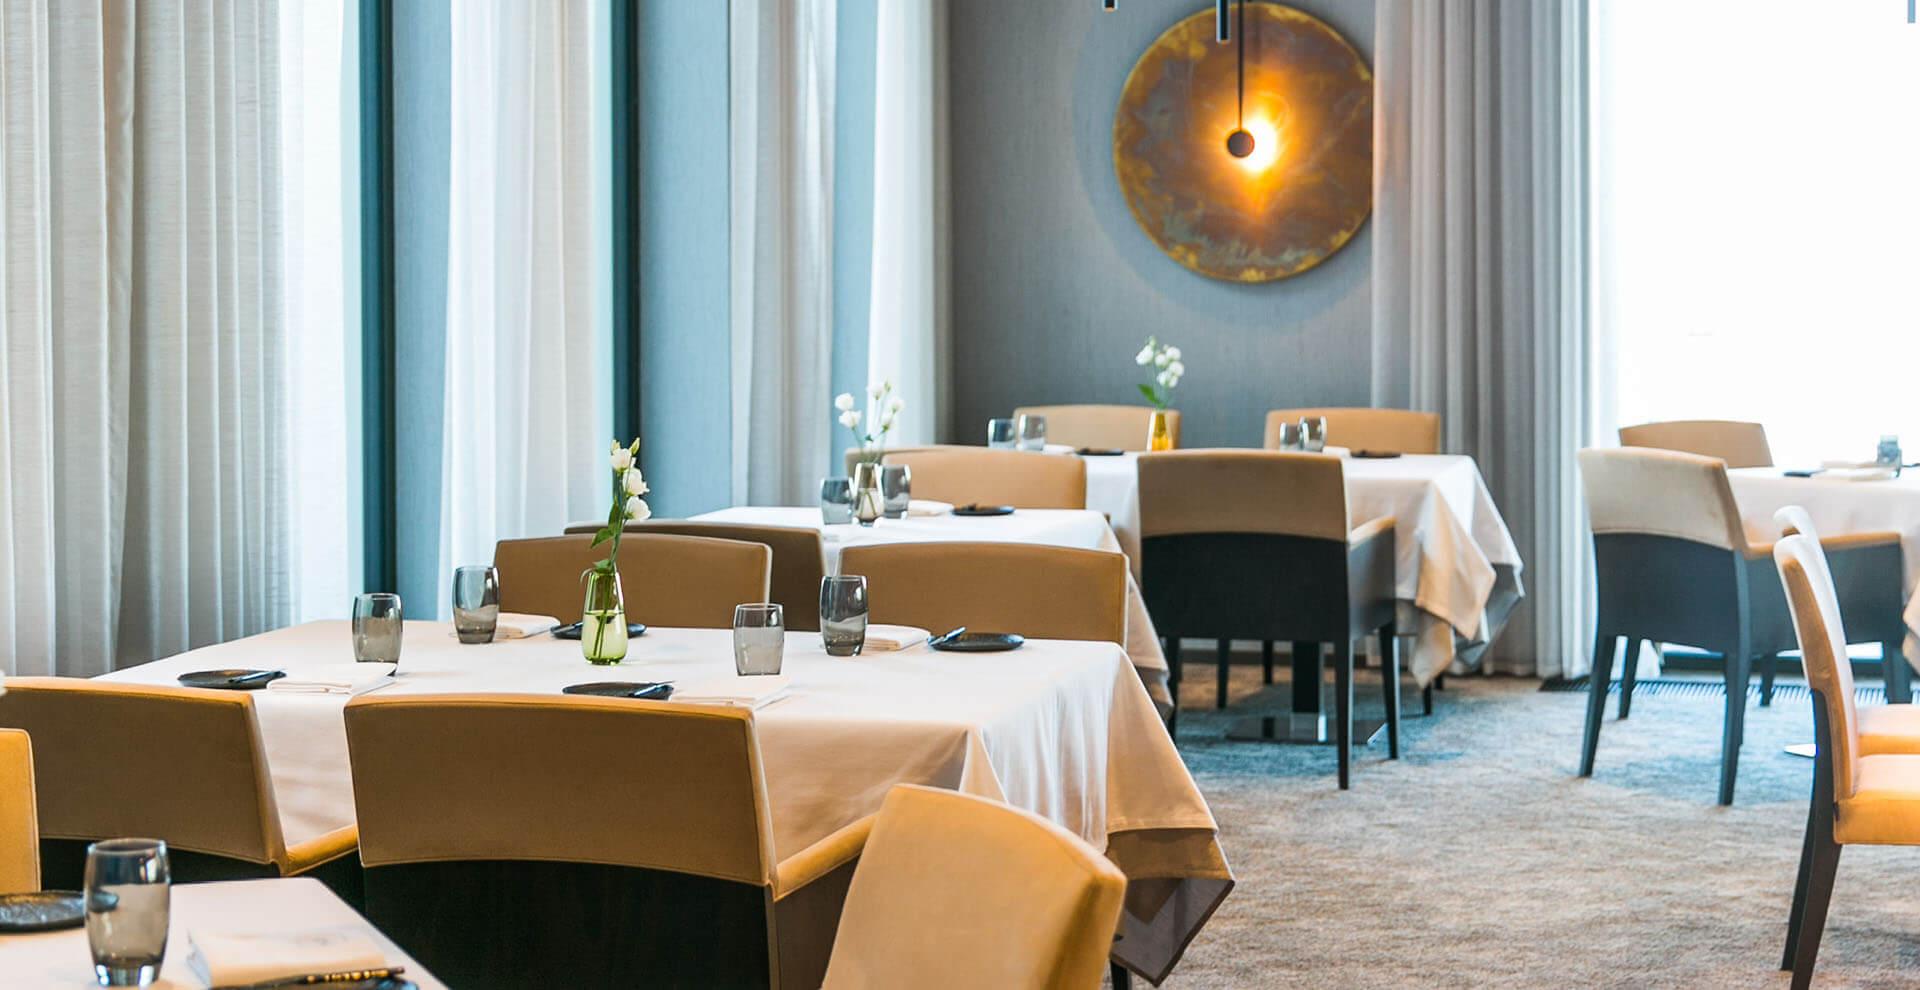 Montbel seating Restaurant 180 Degree Tallin Estonia